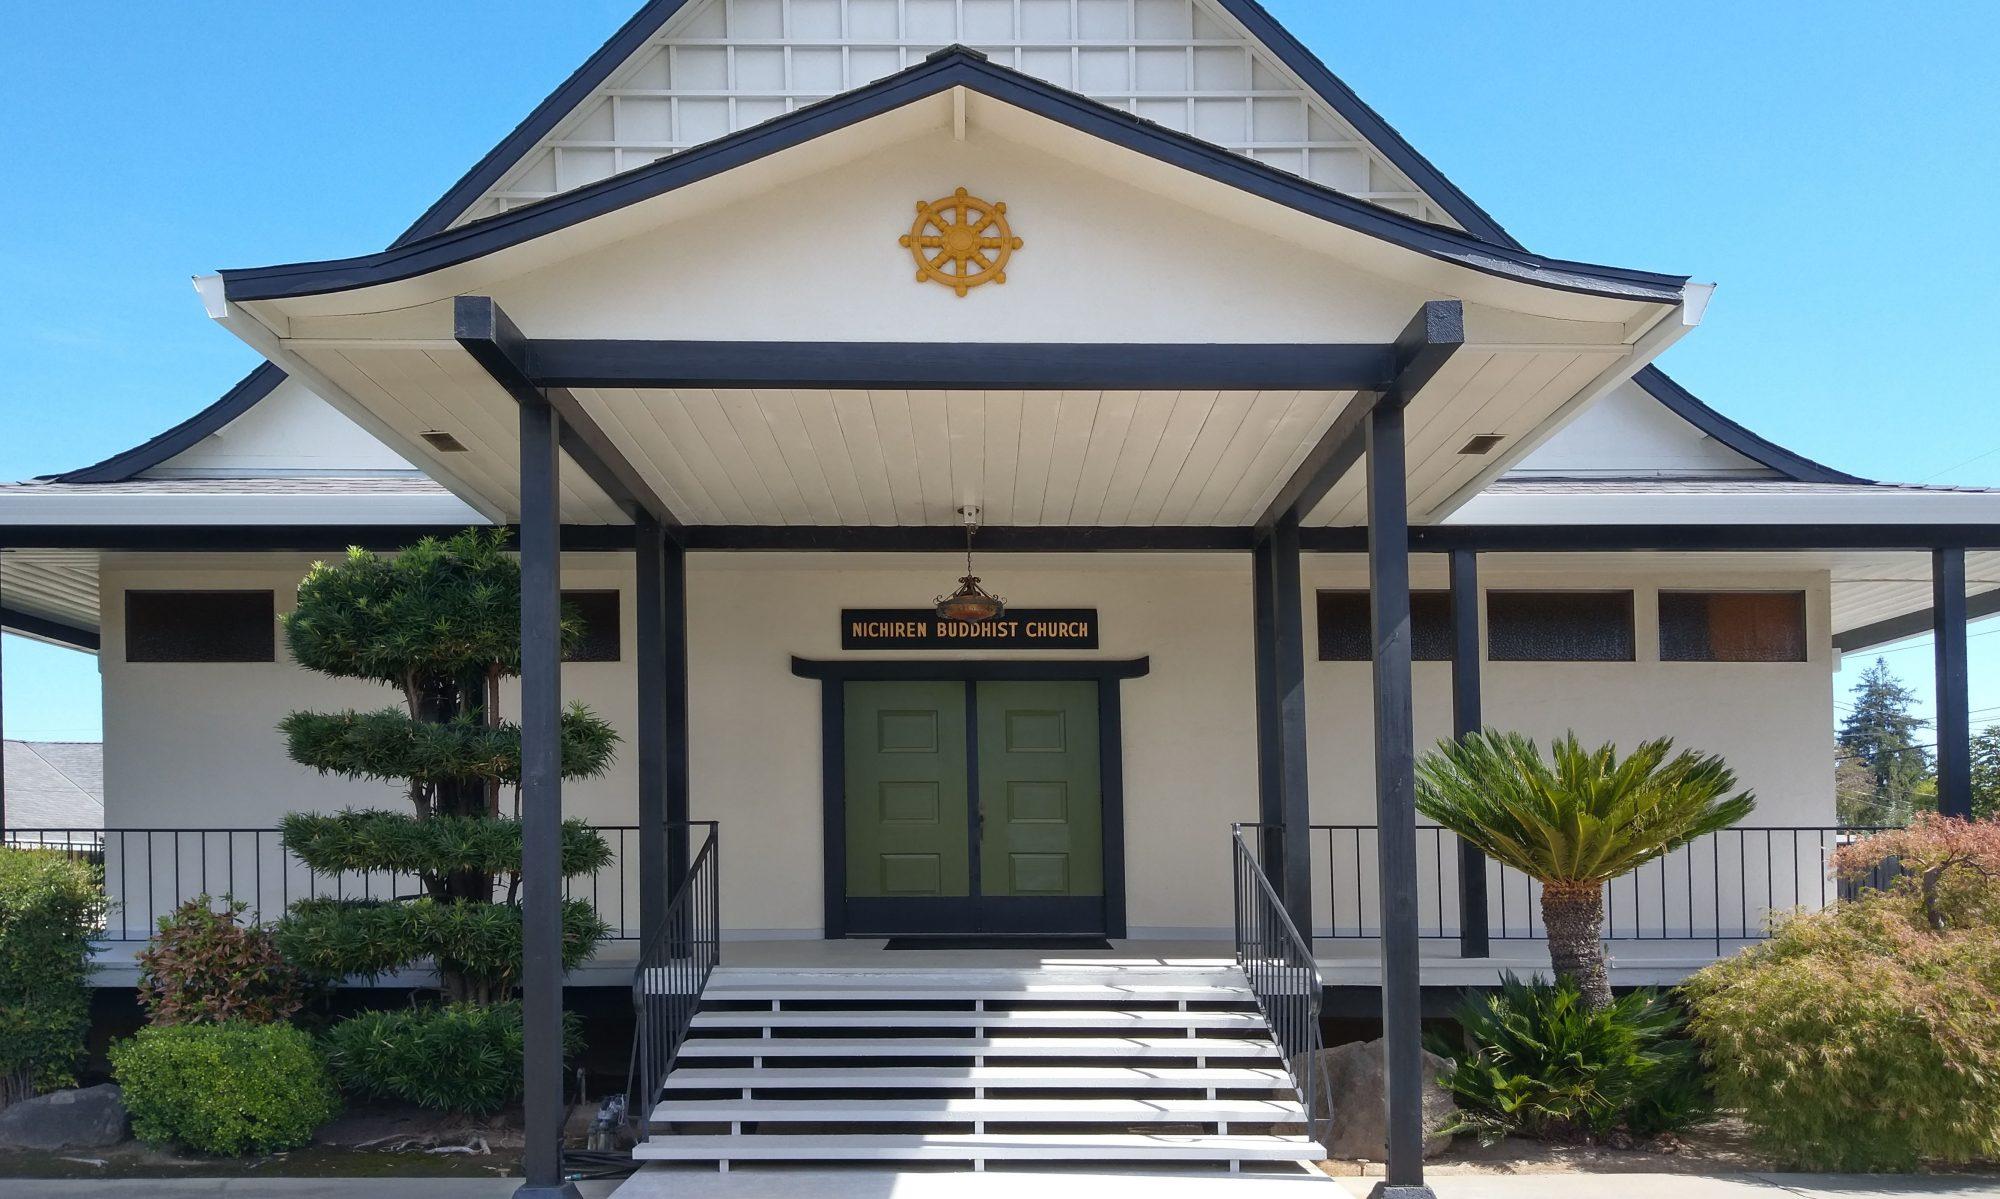 Nichiren Buddhist Church